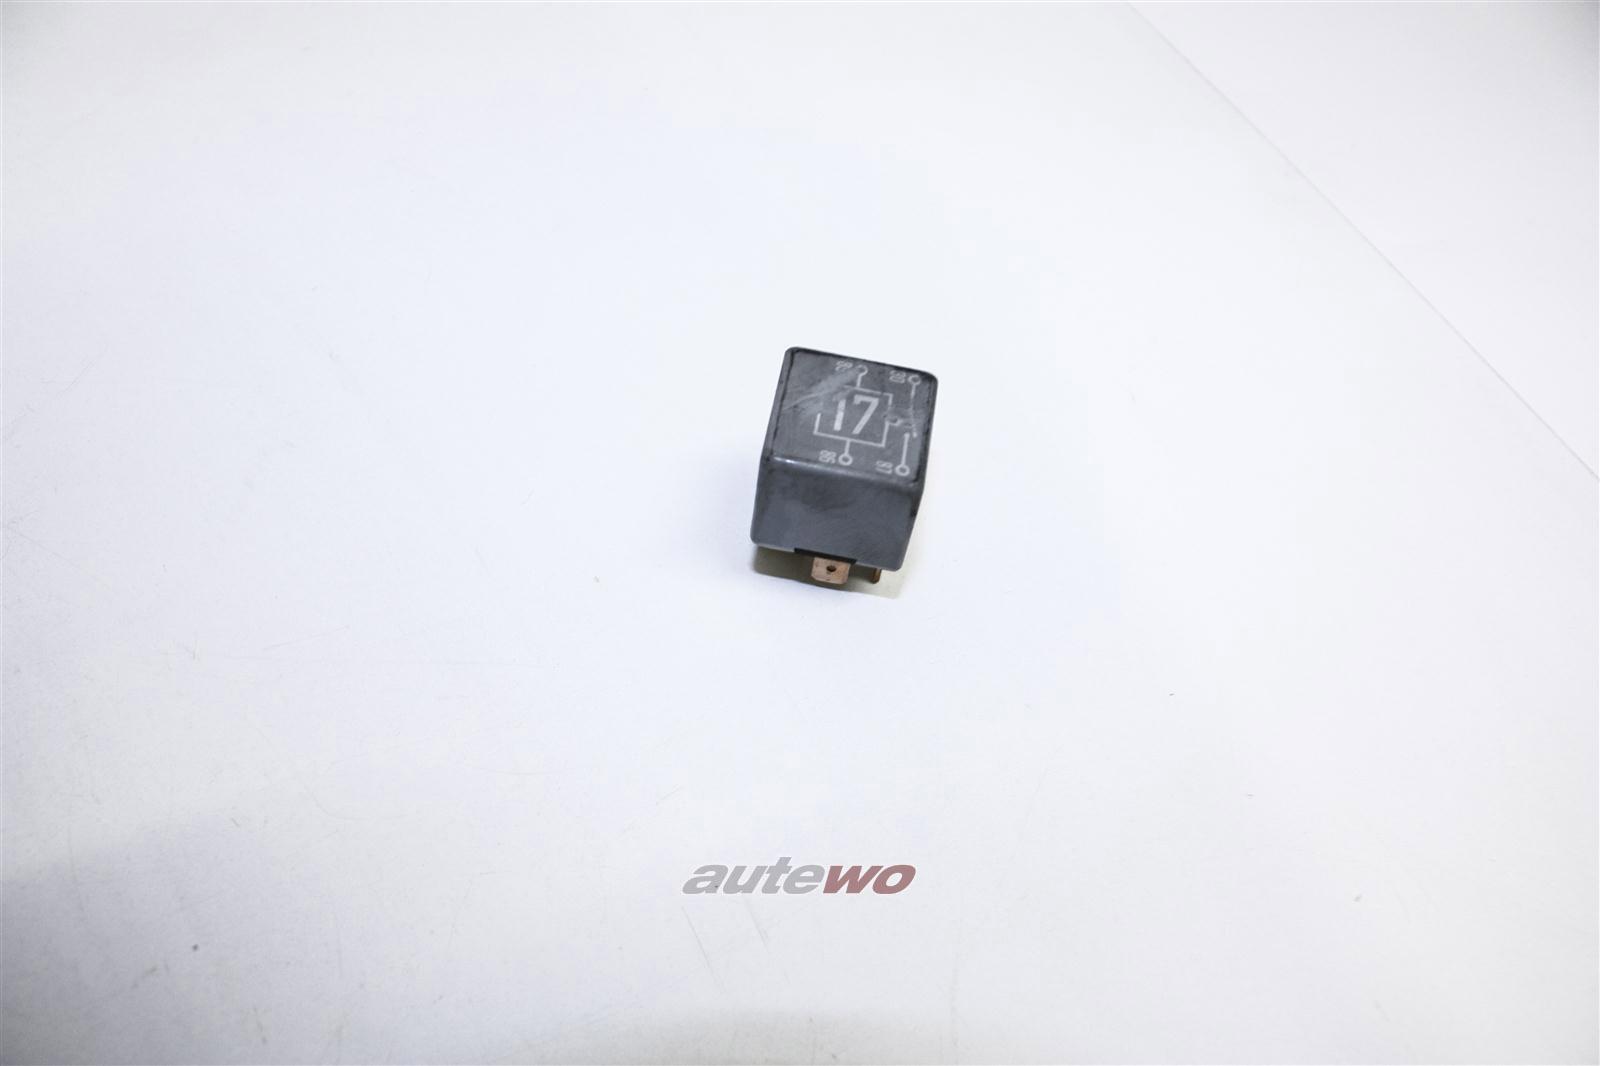 Audi 80/90/100/200 Relais 17 Entlastung X-Kontakt 7M0951253A 171937503A